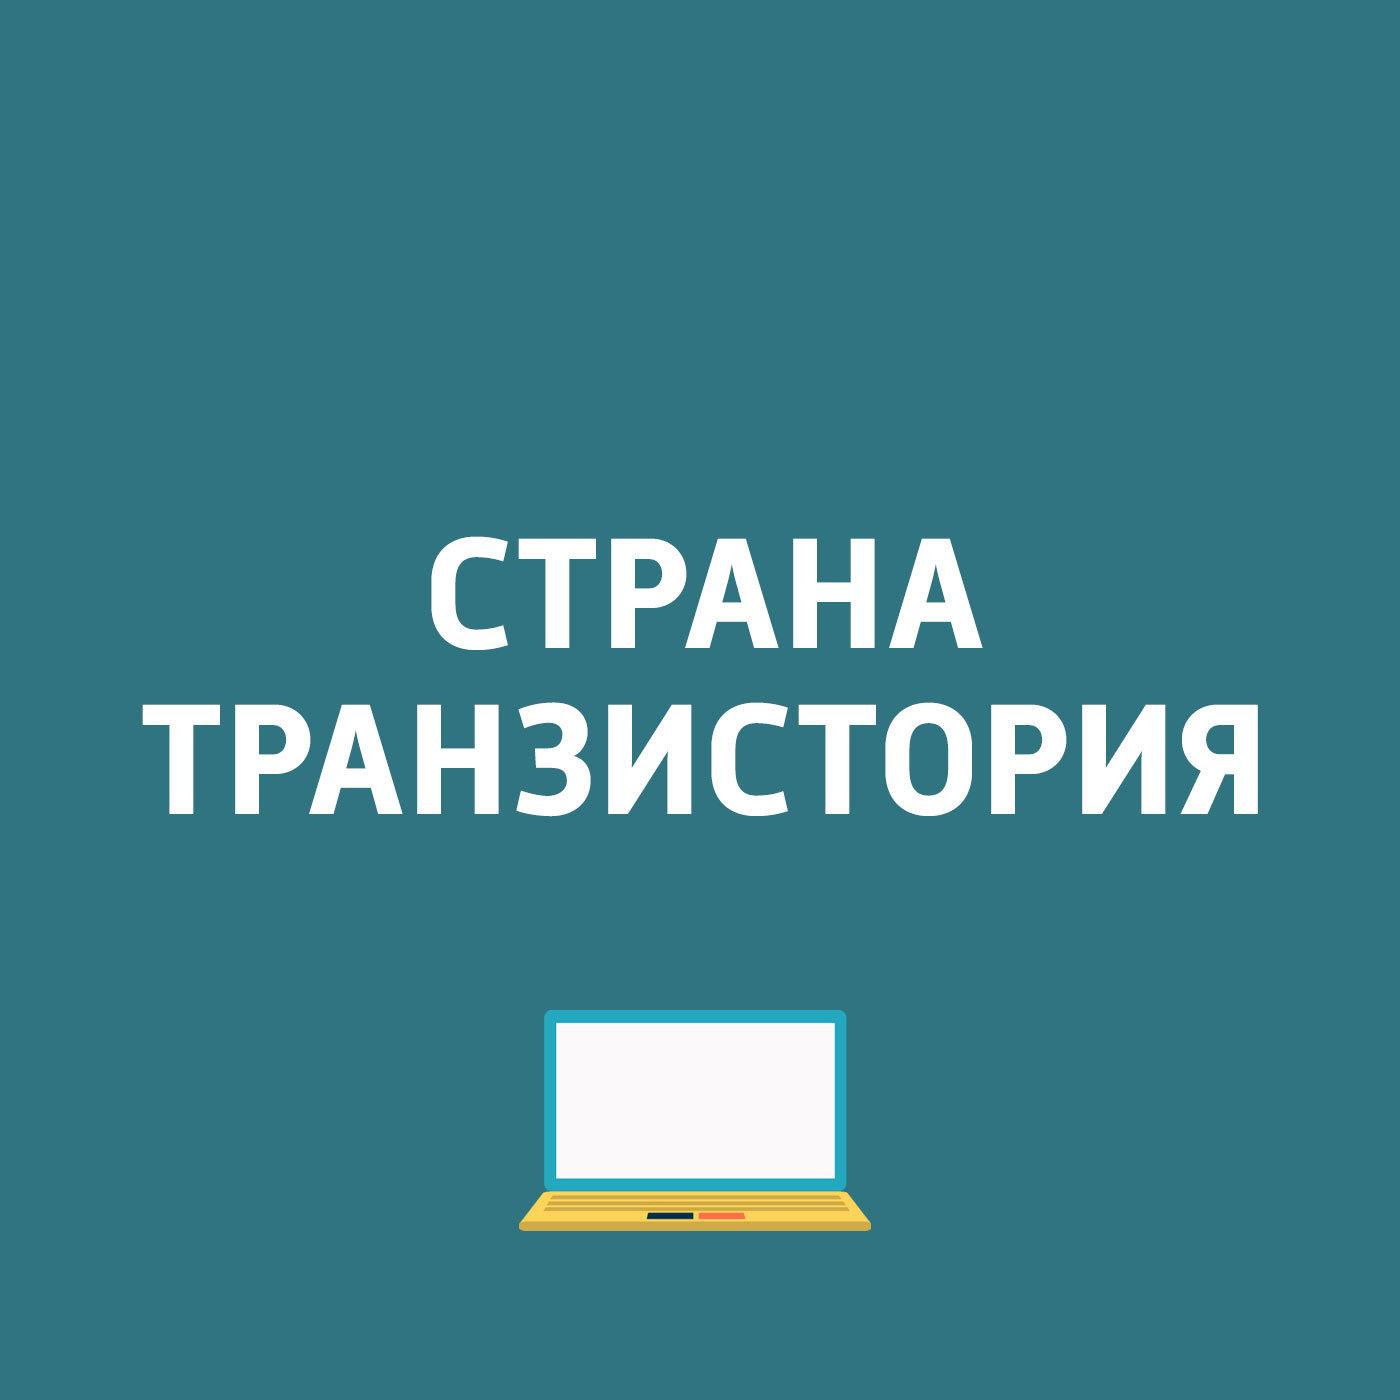 Картаев Павел Aura: сканер документов встроили в настольную лампу сканер документов онлайн